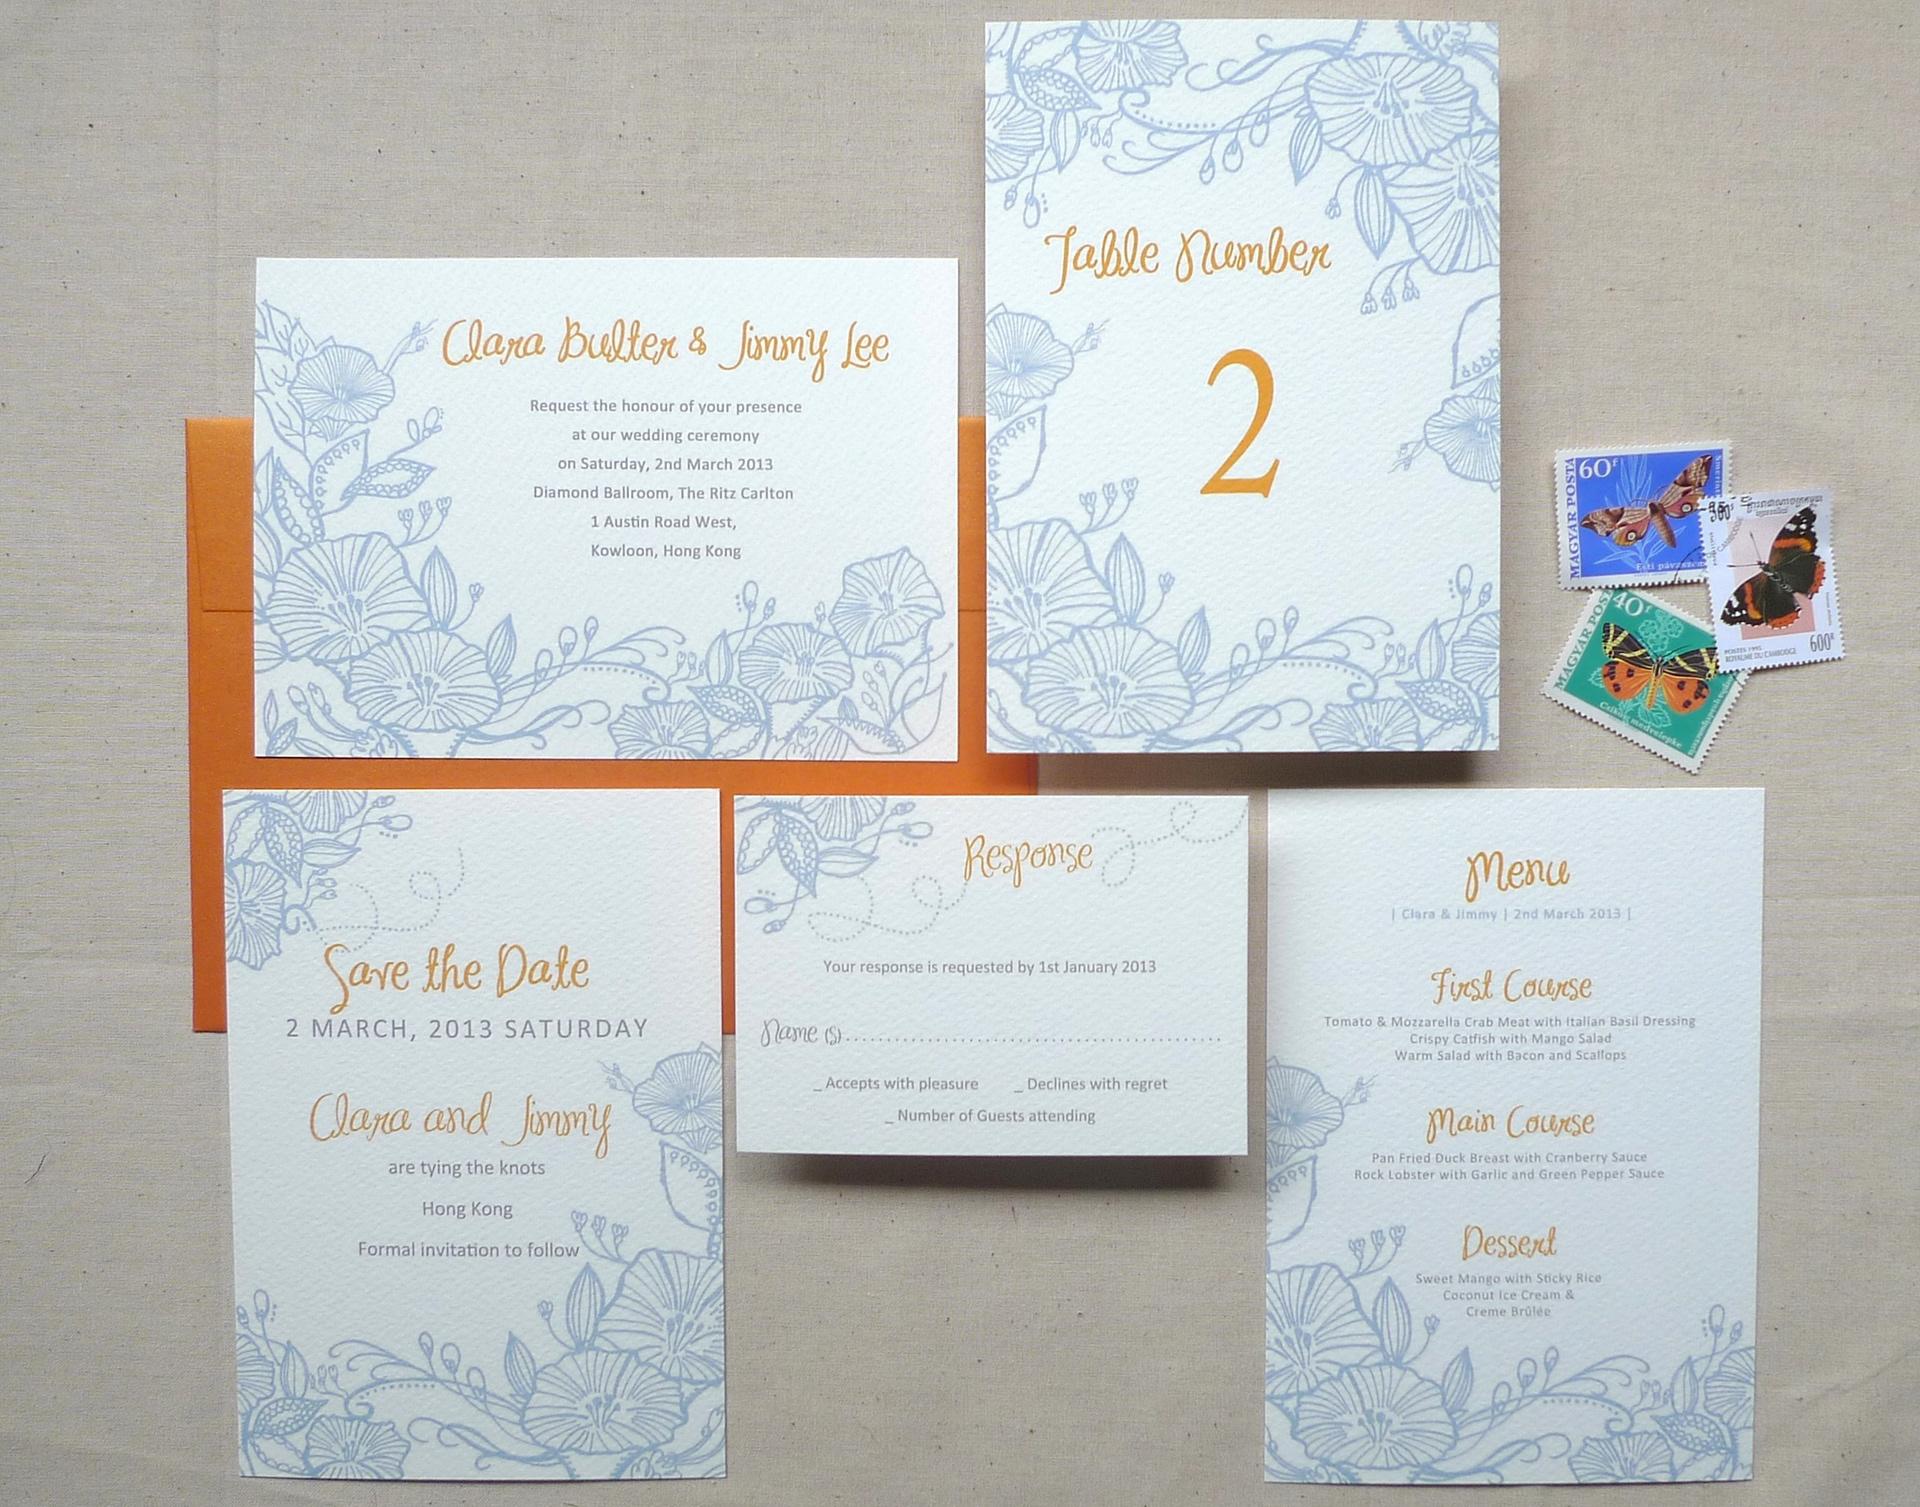 Ka Lo Chu - Royal Pavilion Wedding Invitation